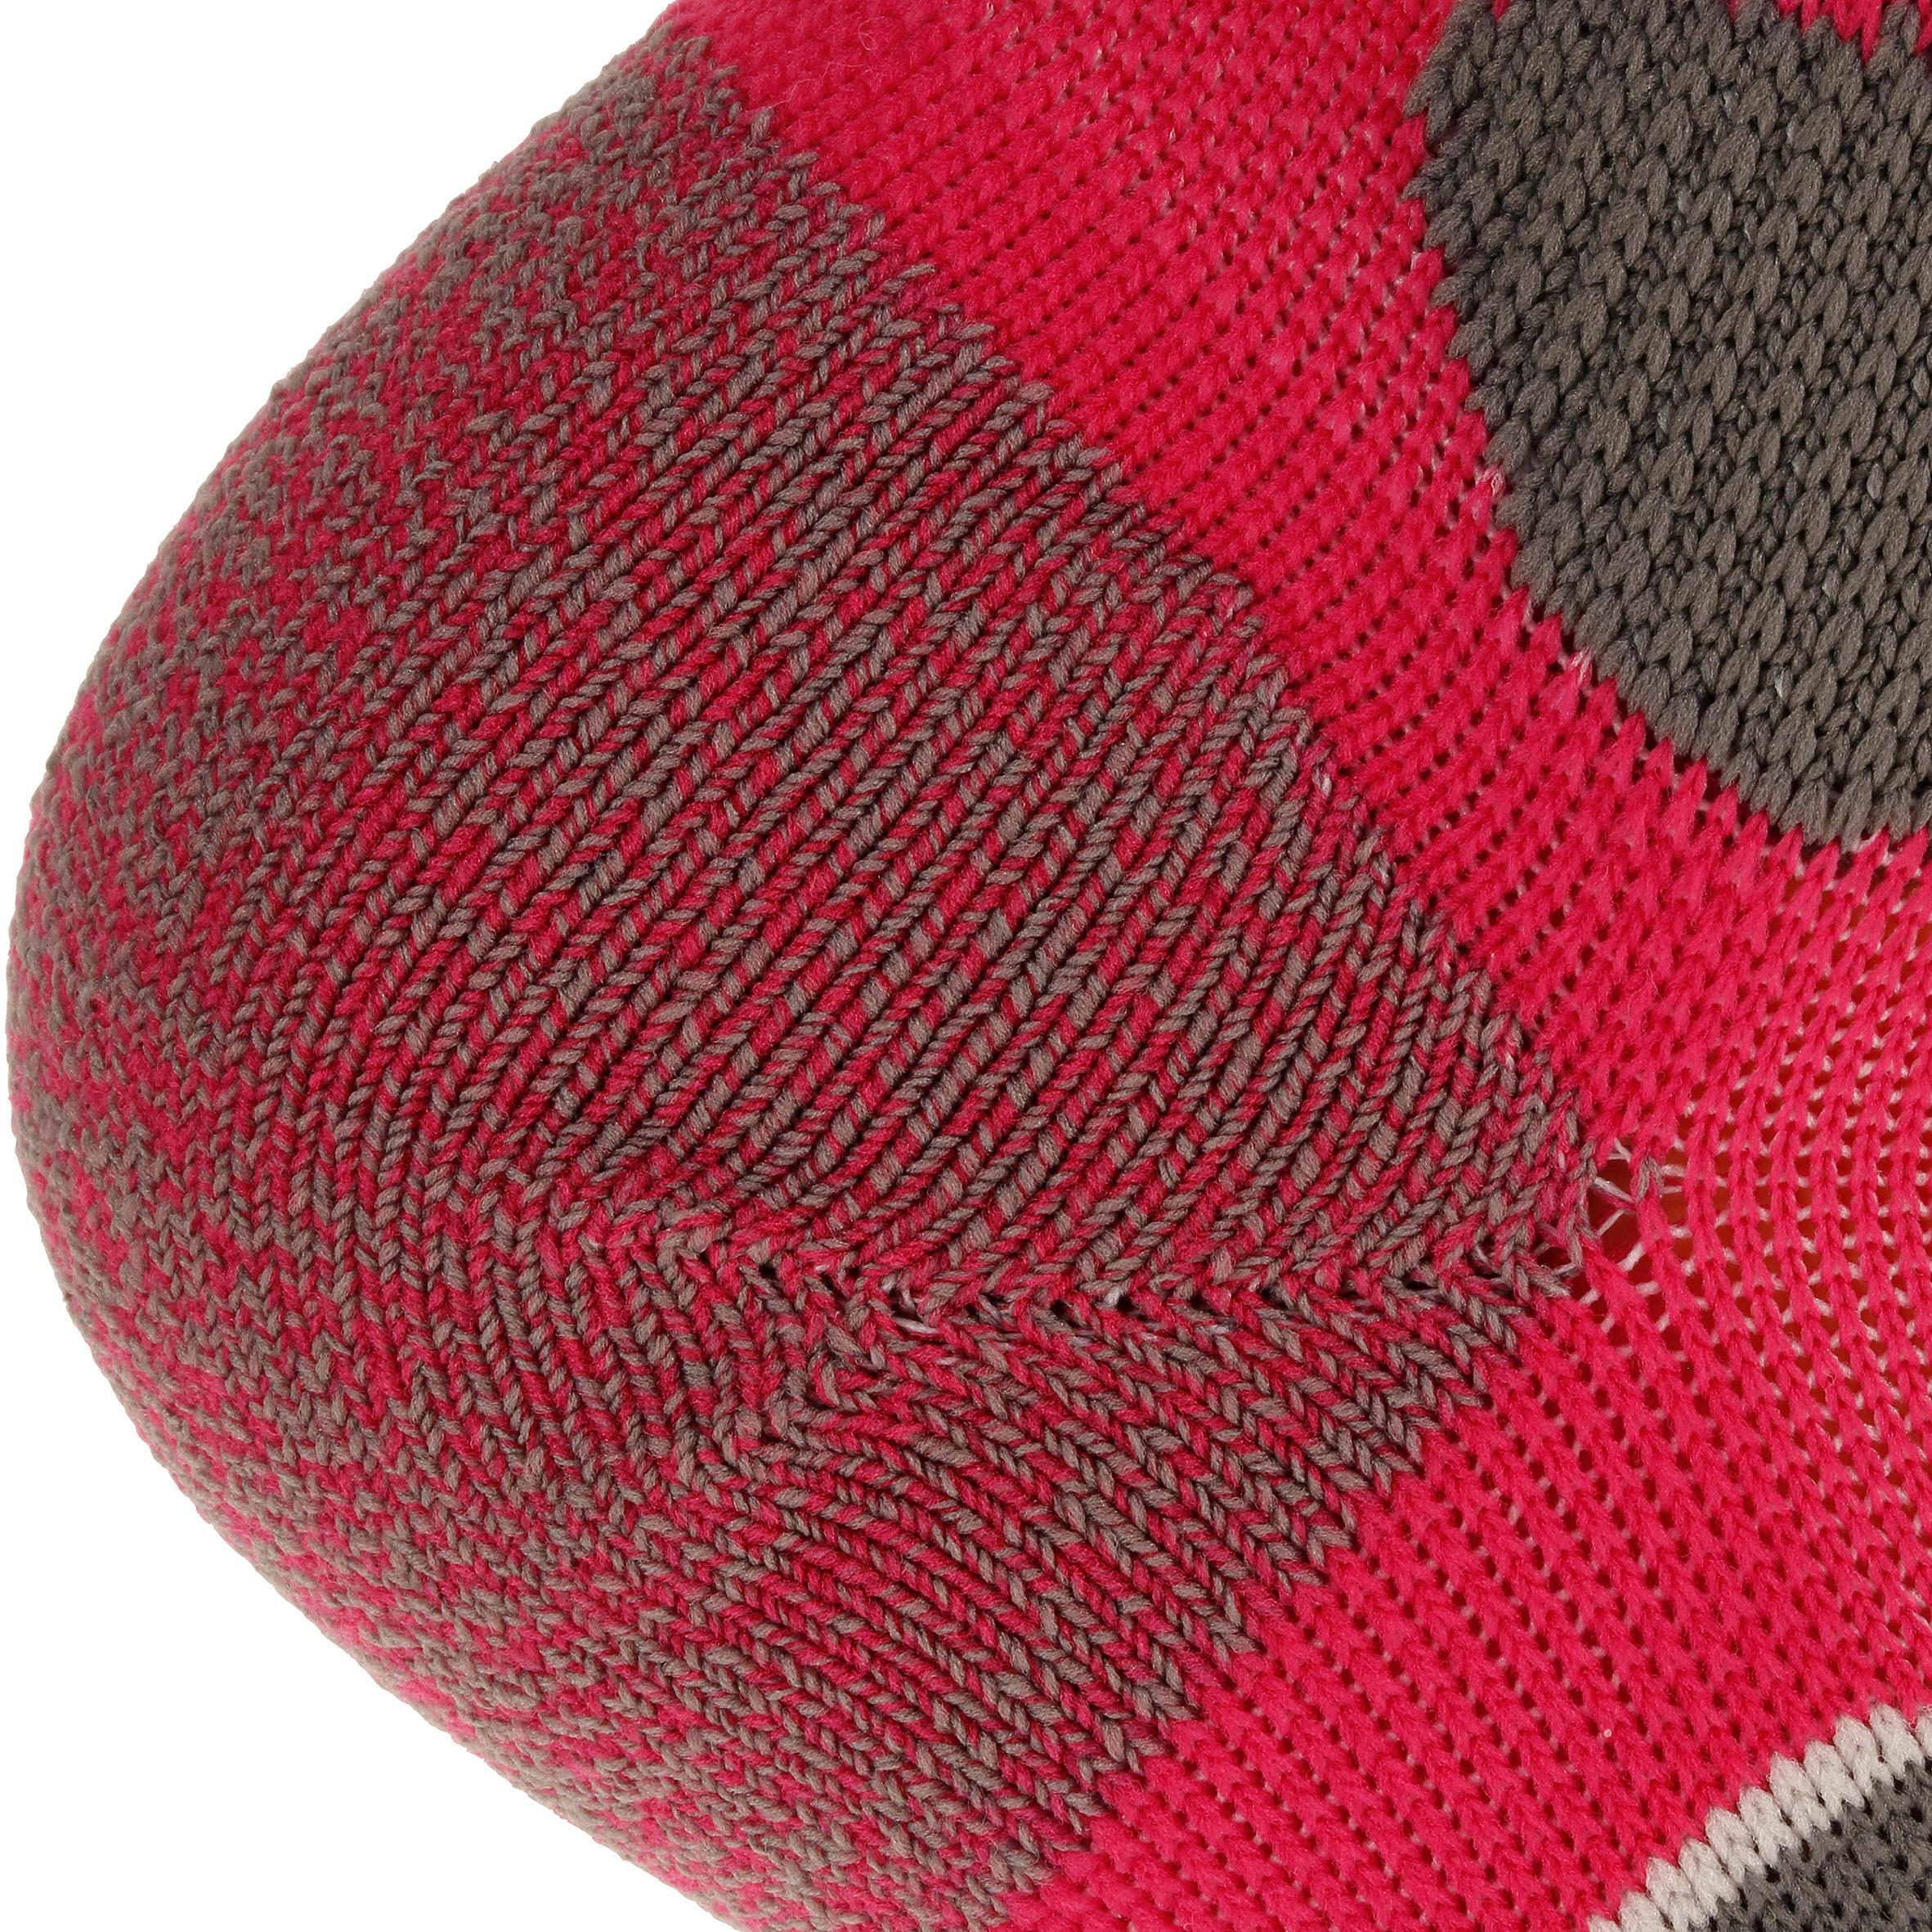 High Cut Mountain Hiking Socks. Forclaz 500 2 Pairs - Pink/Grey